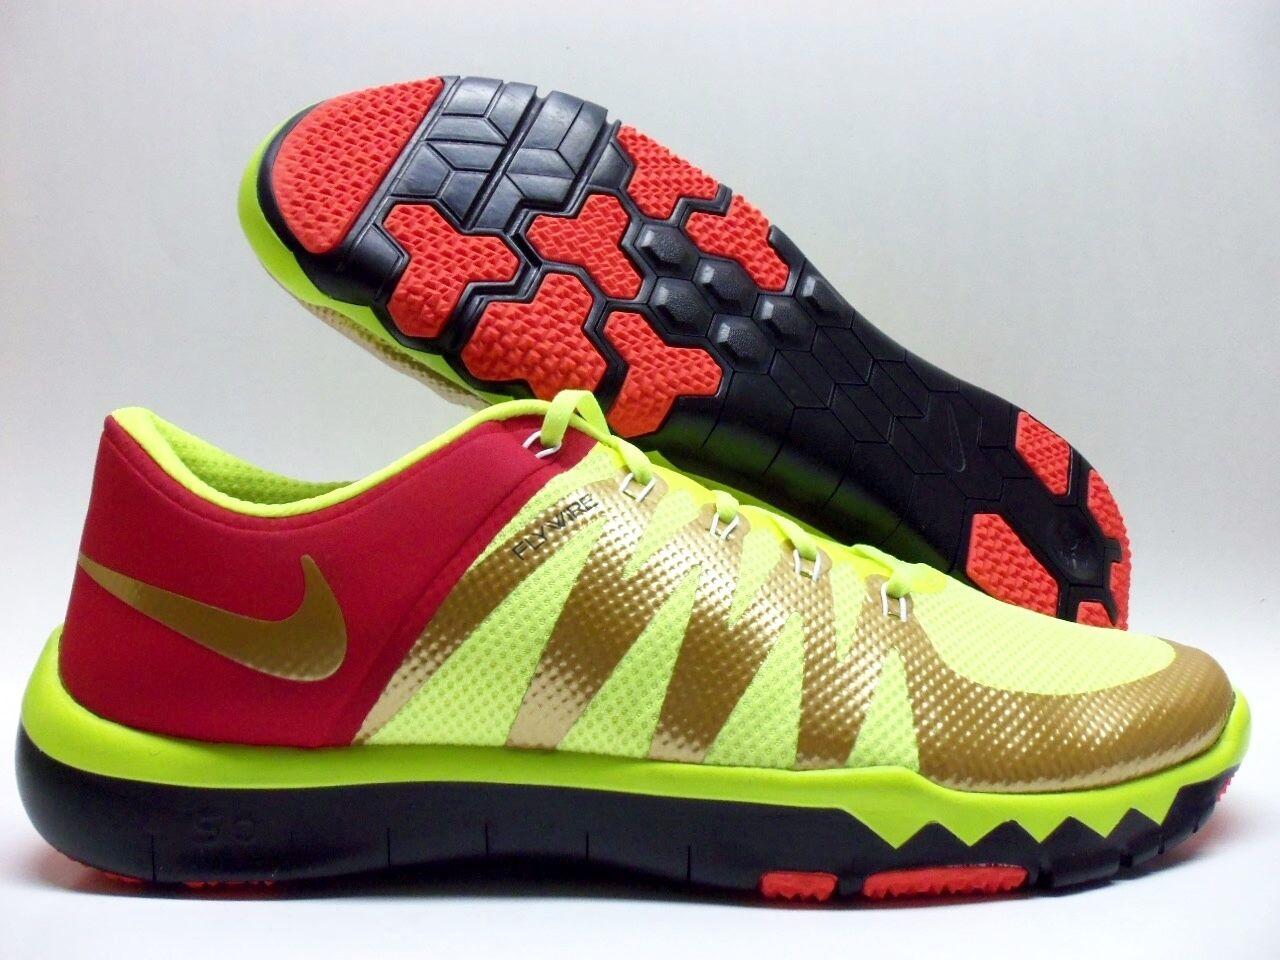 Nike libera 5,0 tr id volt / gold-gym dimensioni metallico red-nero dimensioni gold-gym uomini 15 - 803218-991] 4ae4cf